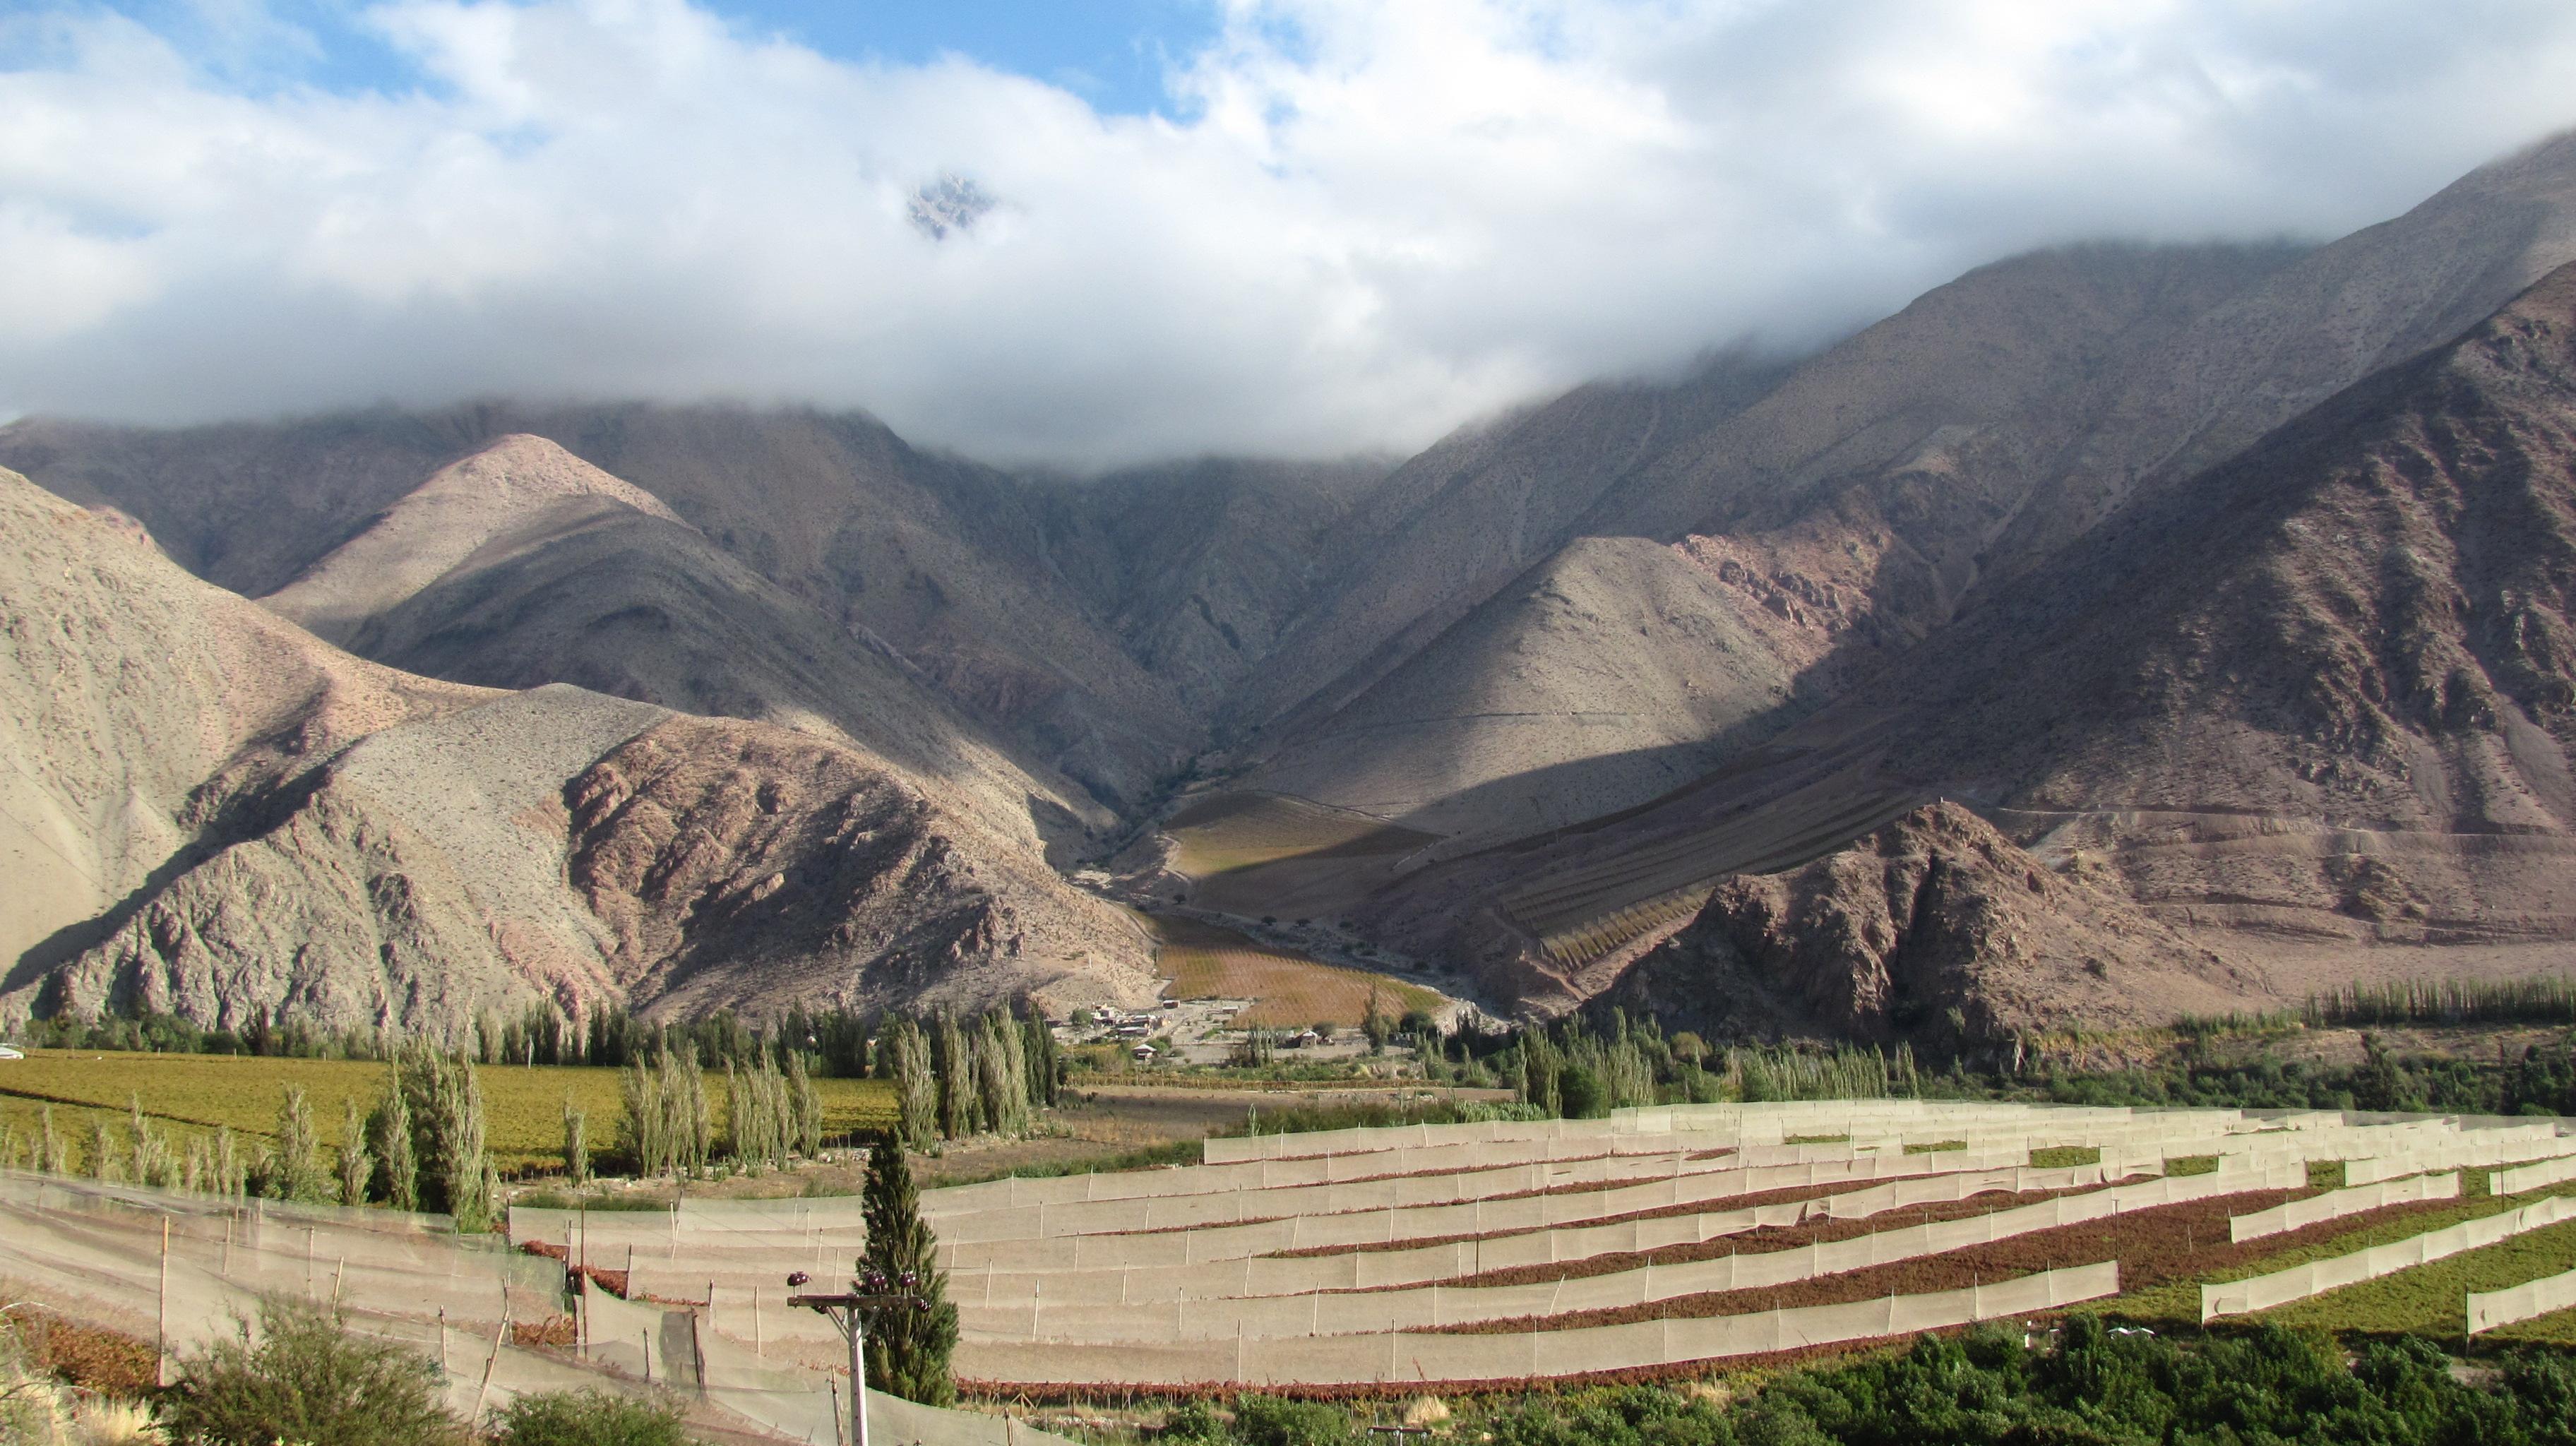 Vale de Elqui – Wikipédia, a enciclopédia livre